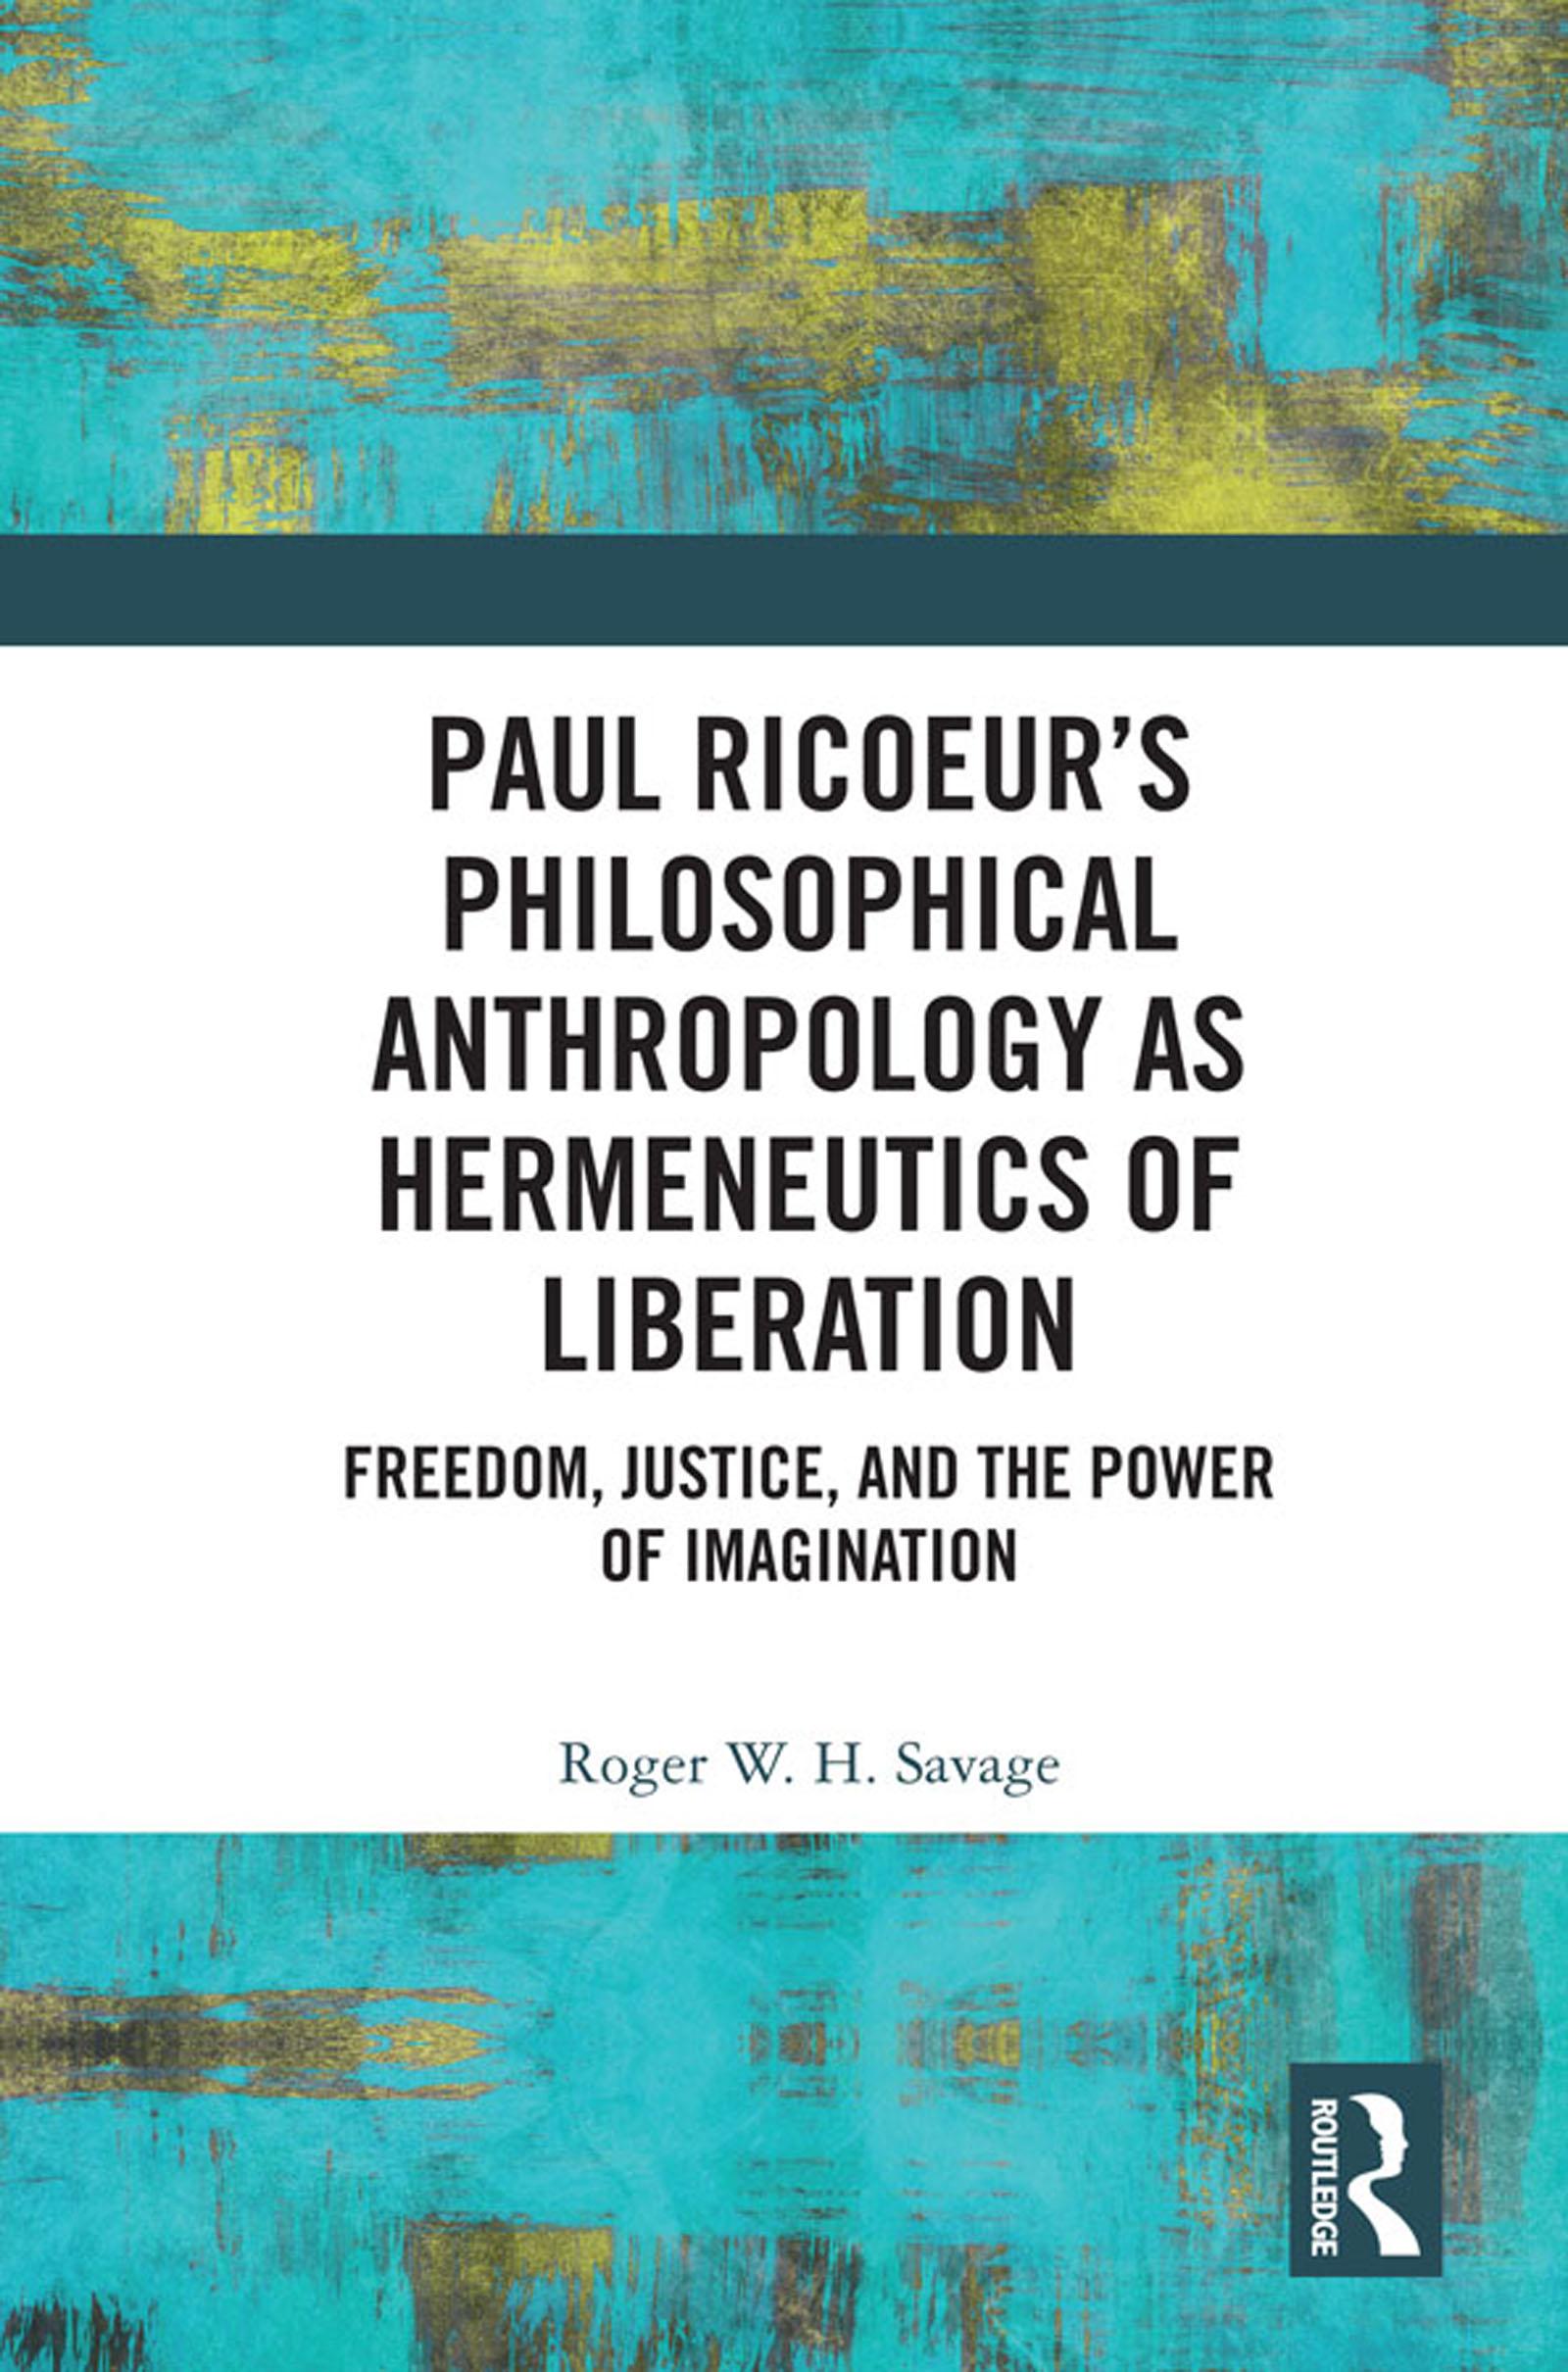 Toward a Hermeneutics of Liberation